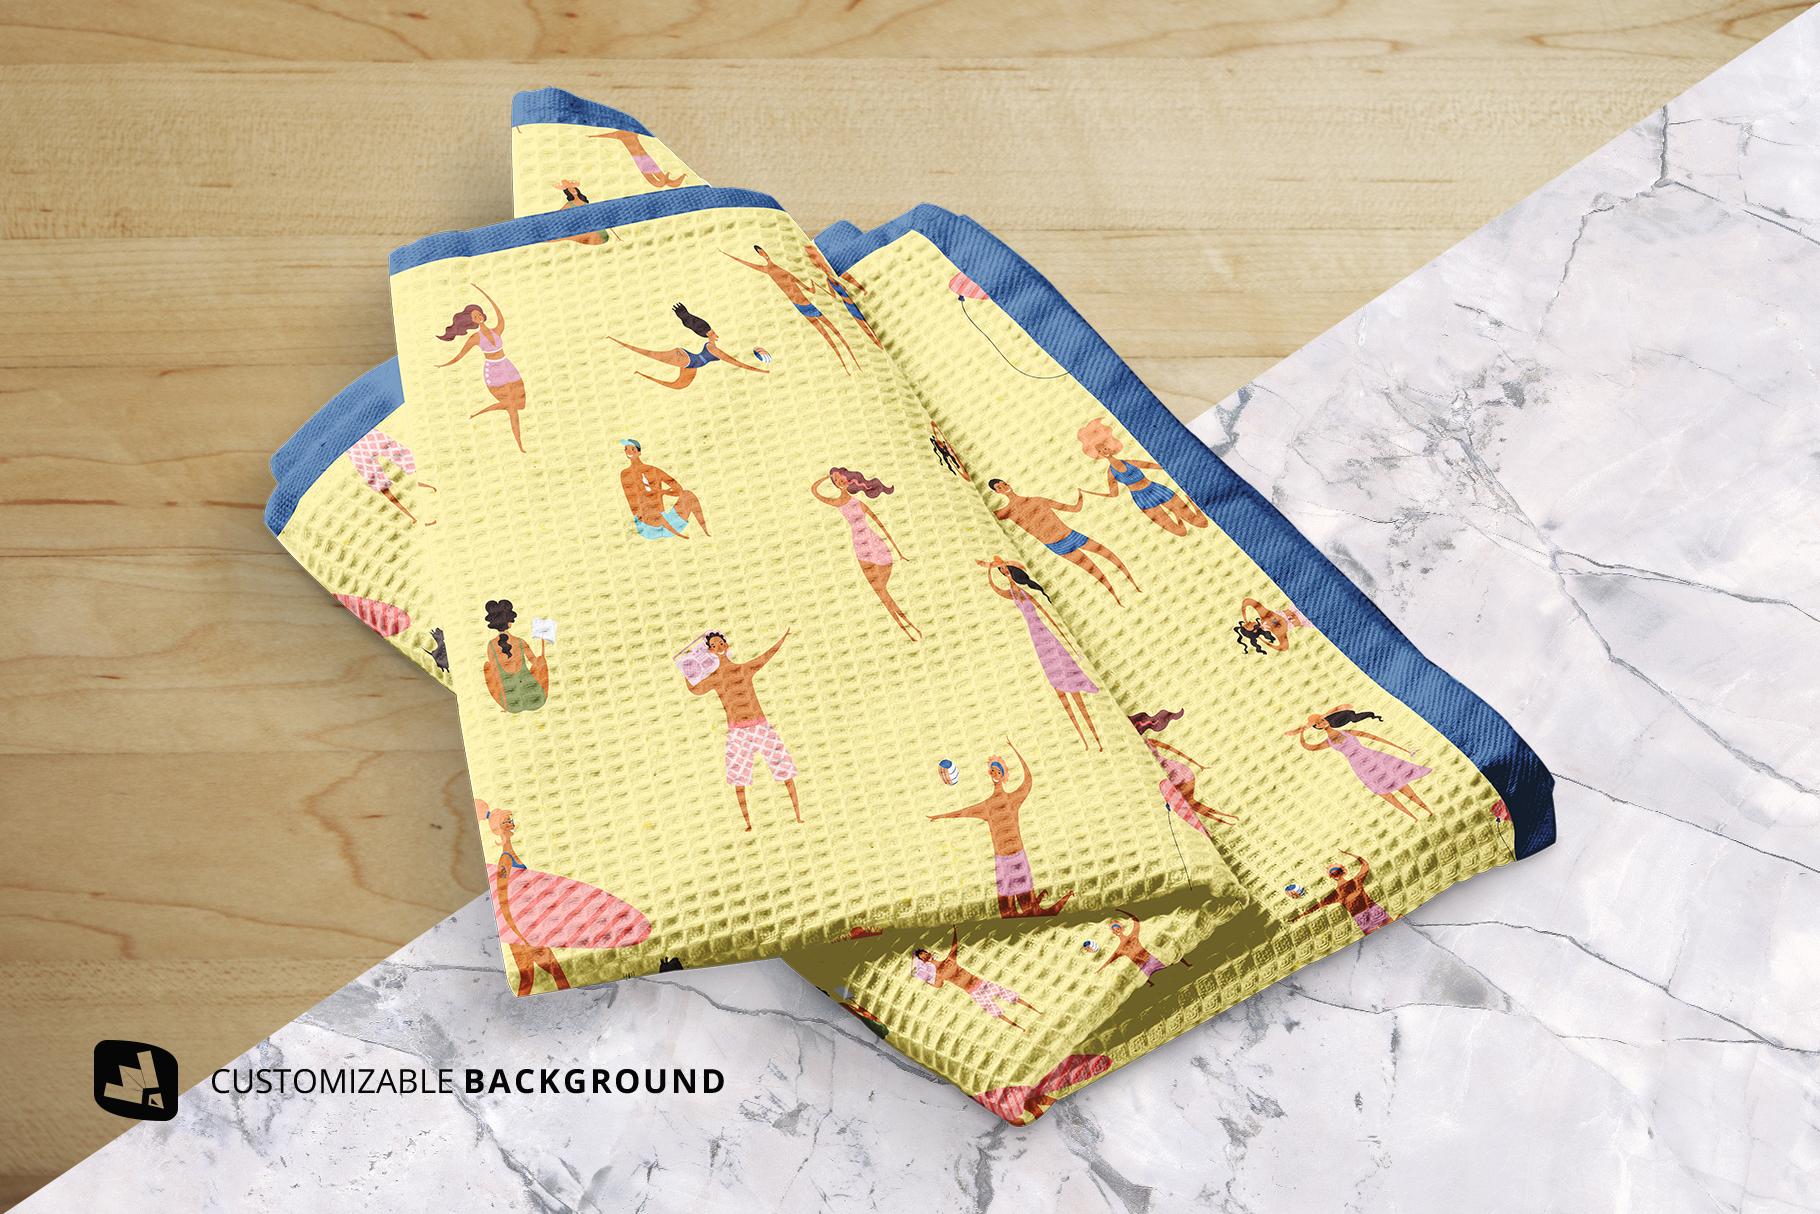 background options of the kitchen washcloth mockup